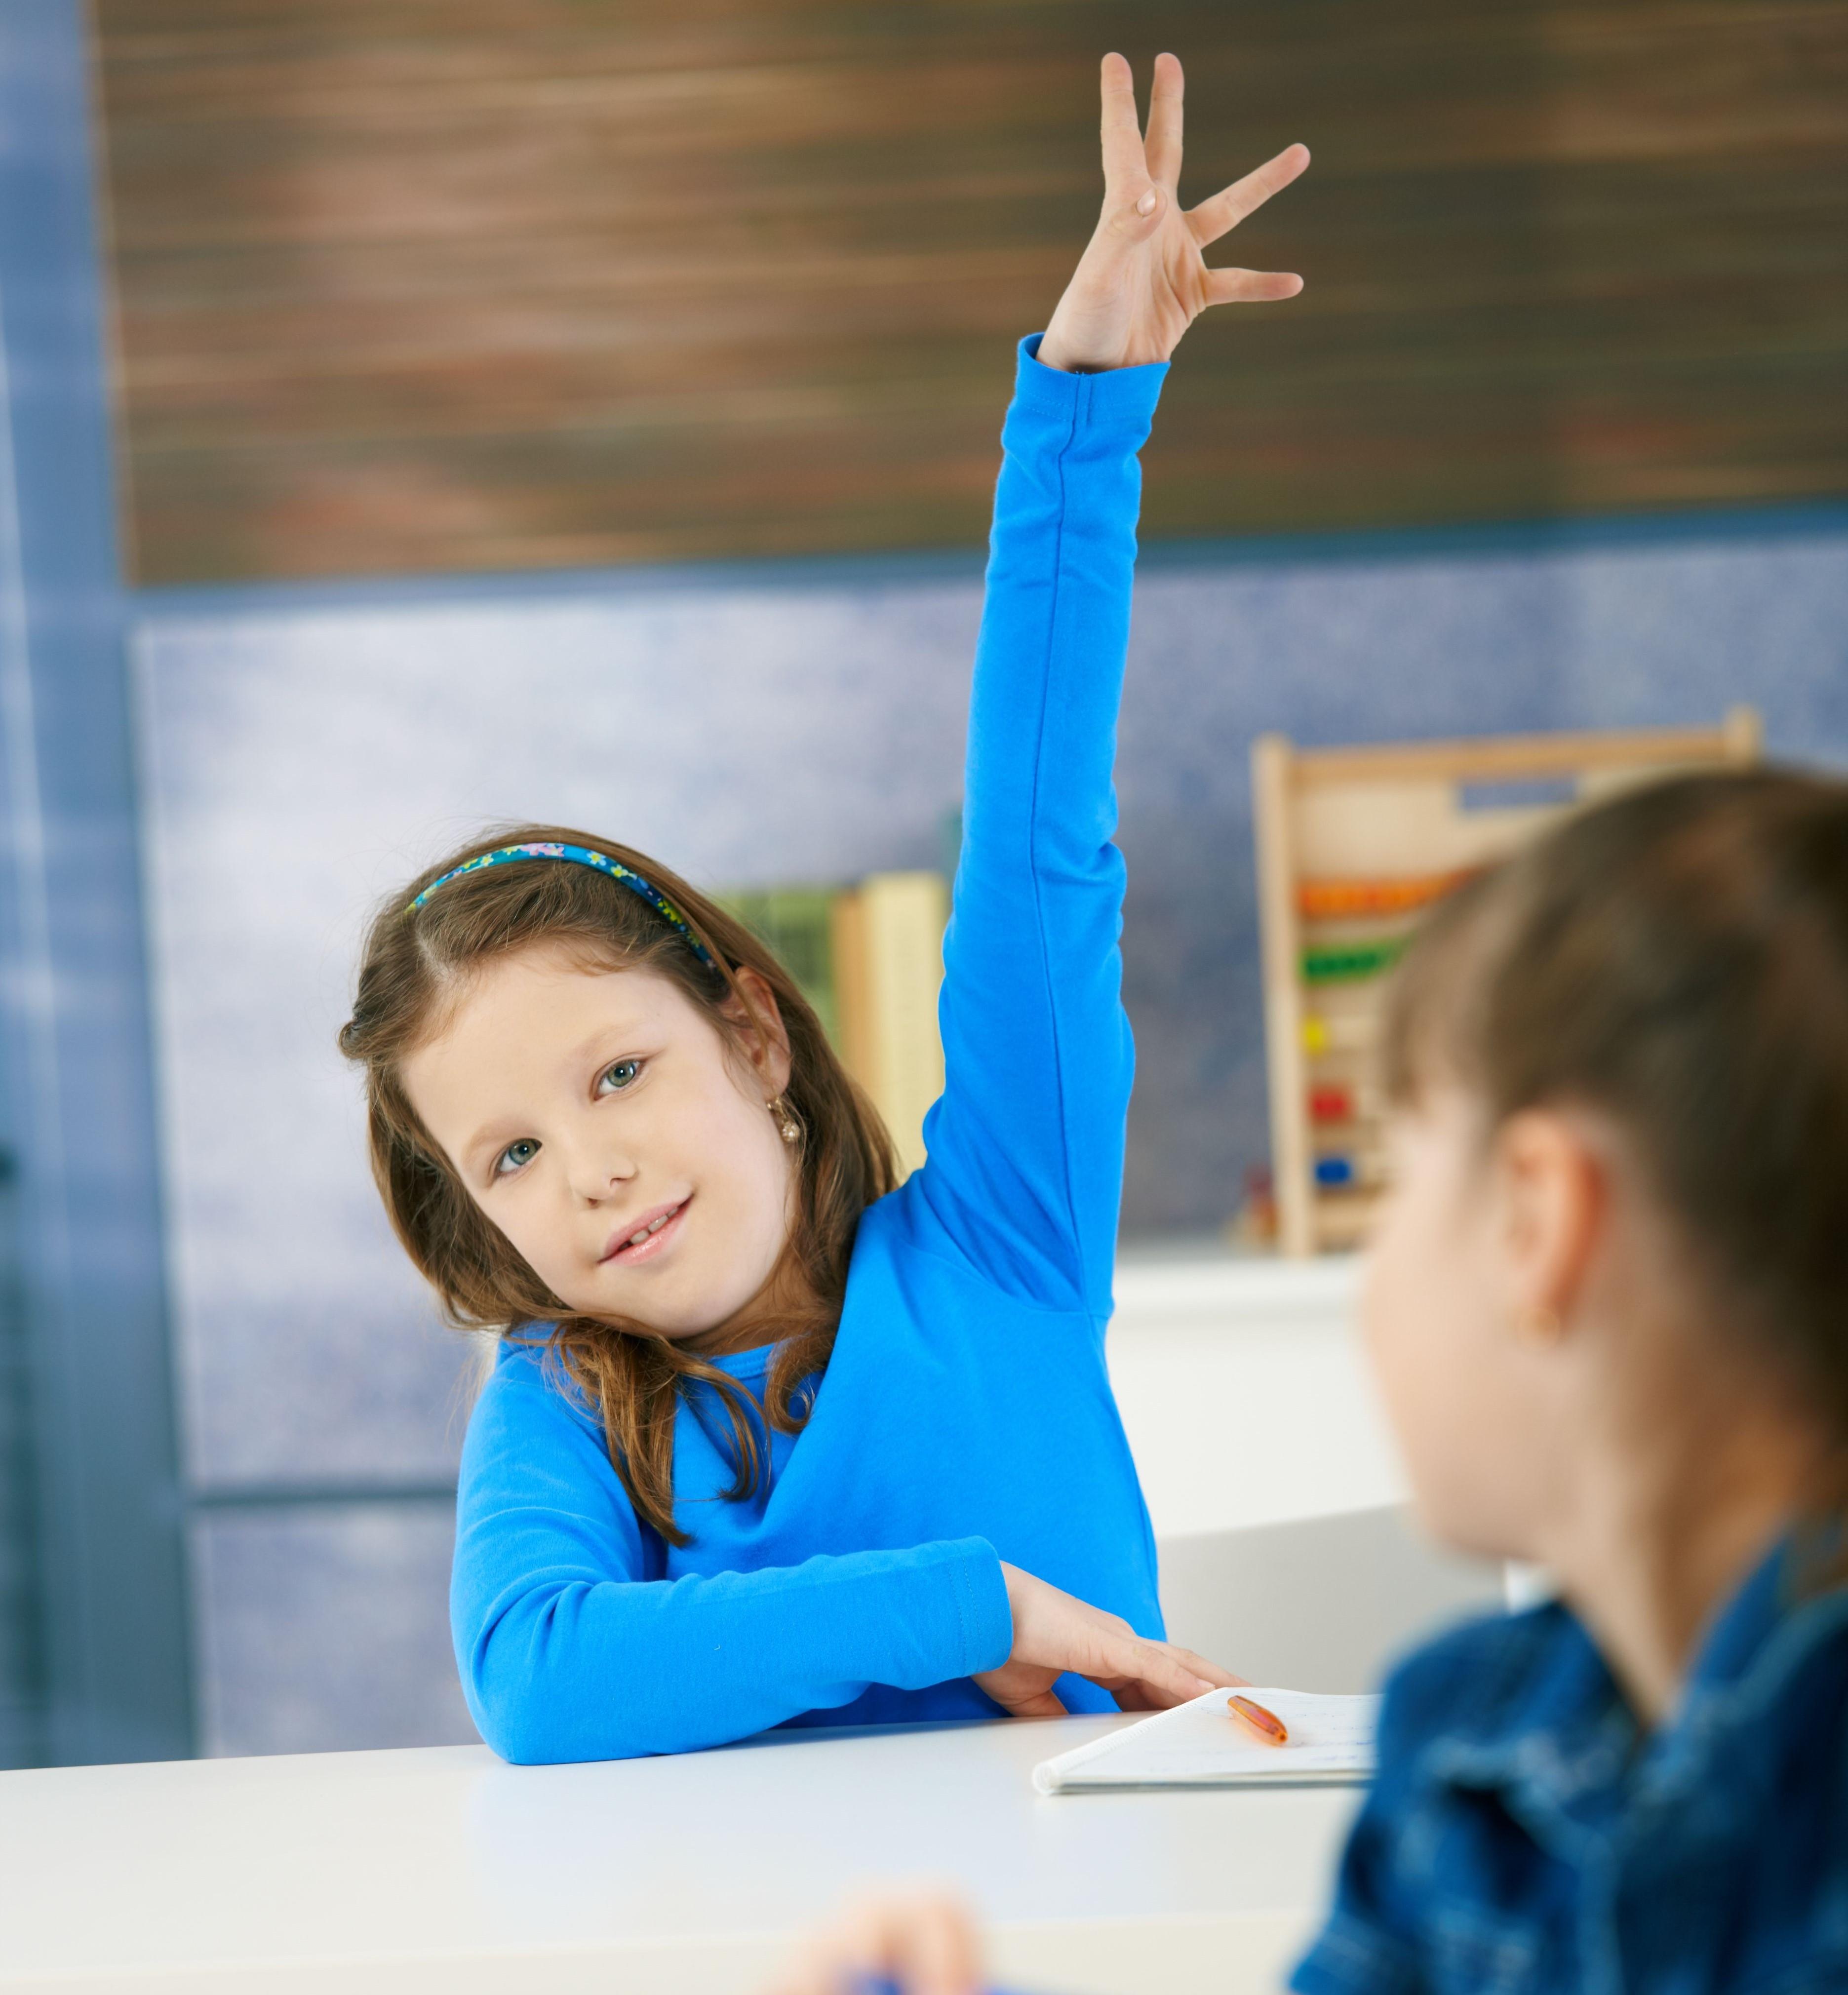 6463827_xxl kid hand raised-1